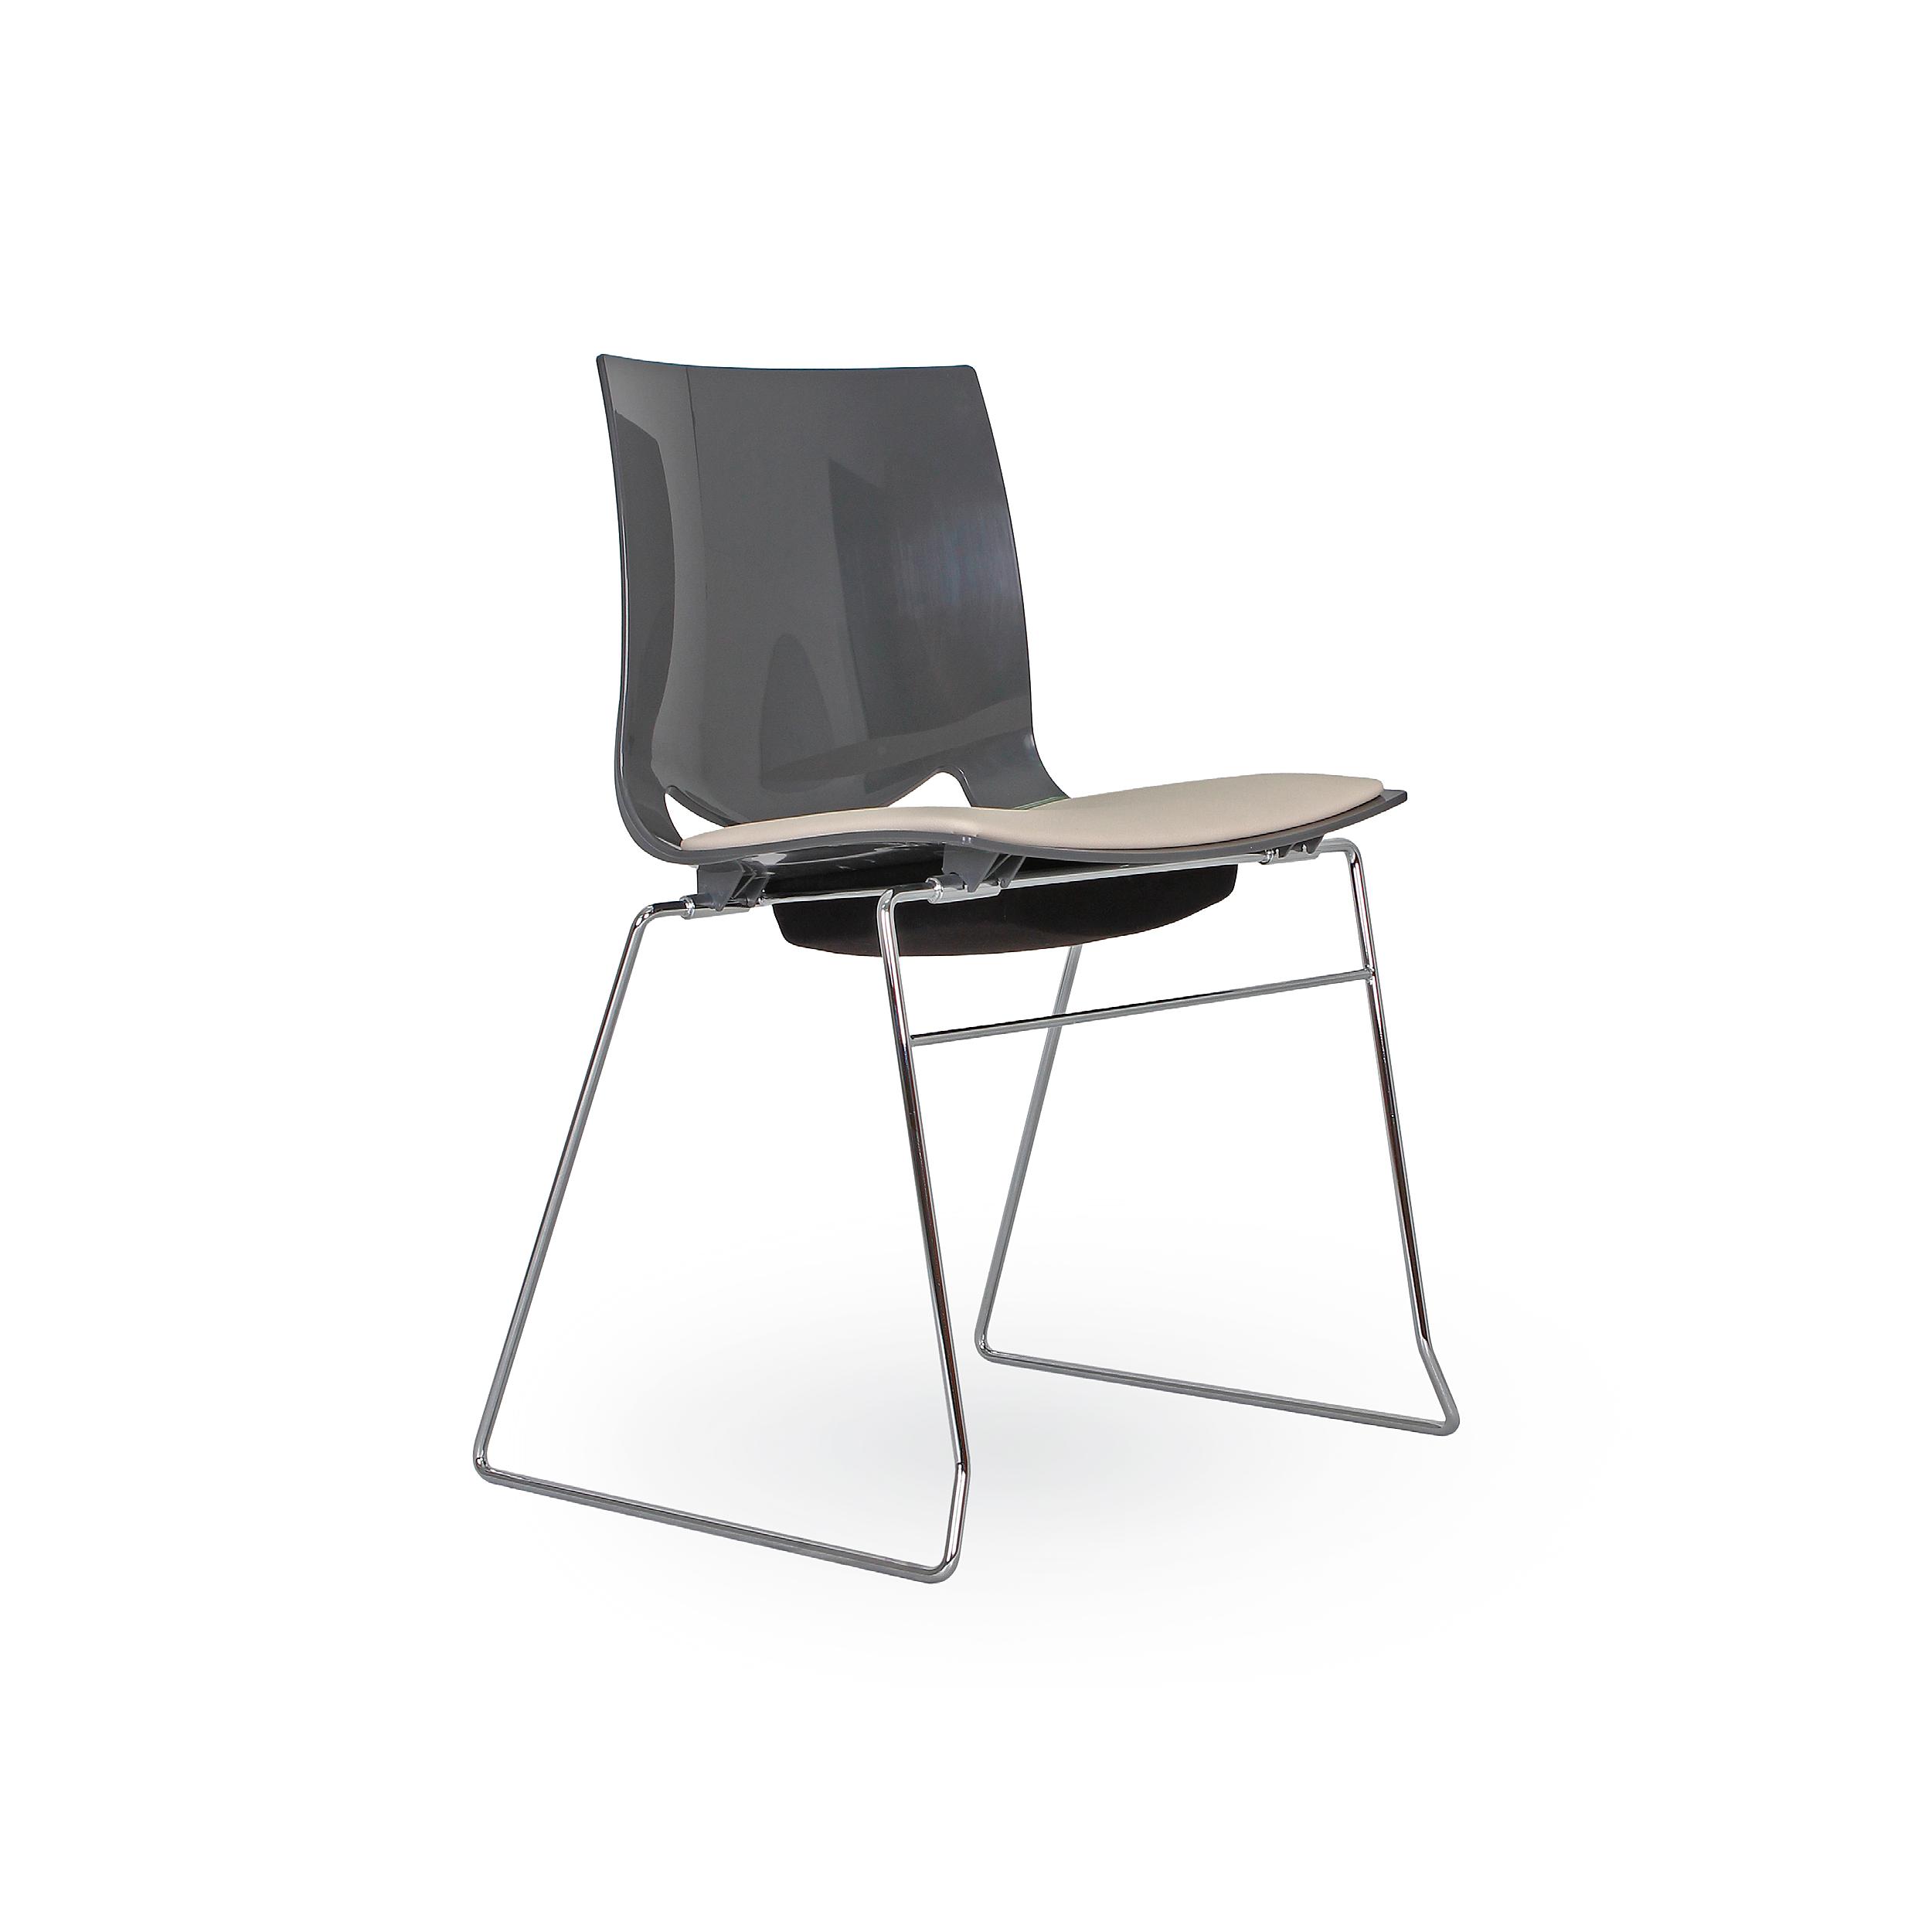 office-chairs_1-1_Mojito-29.jpg